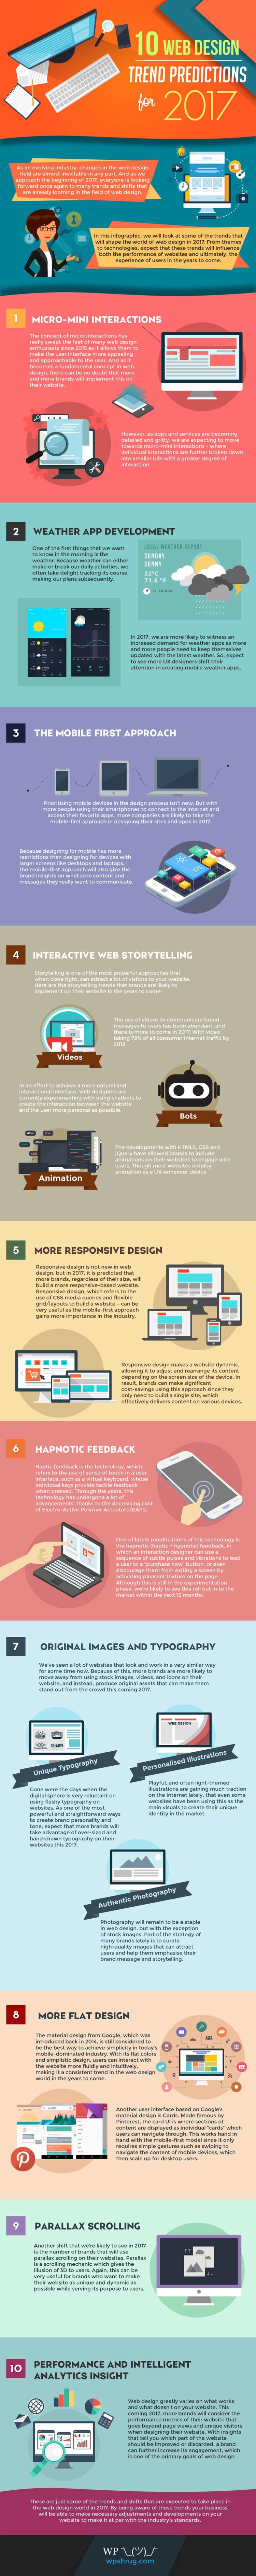 webdesigntrendpredictionsfor2017_